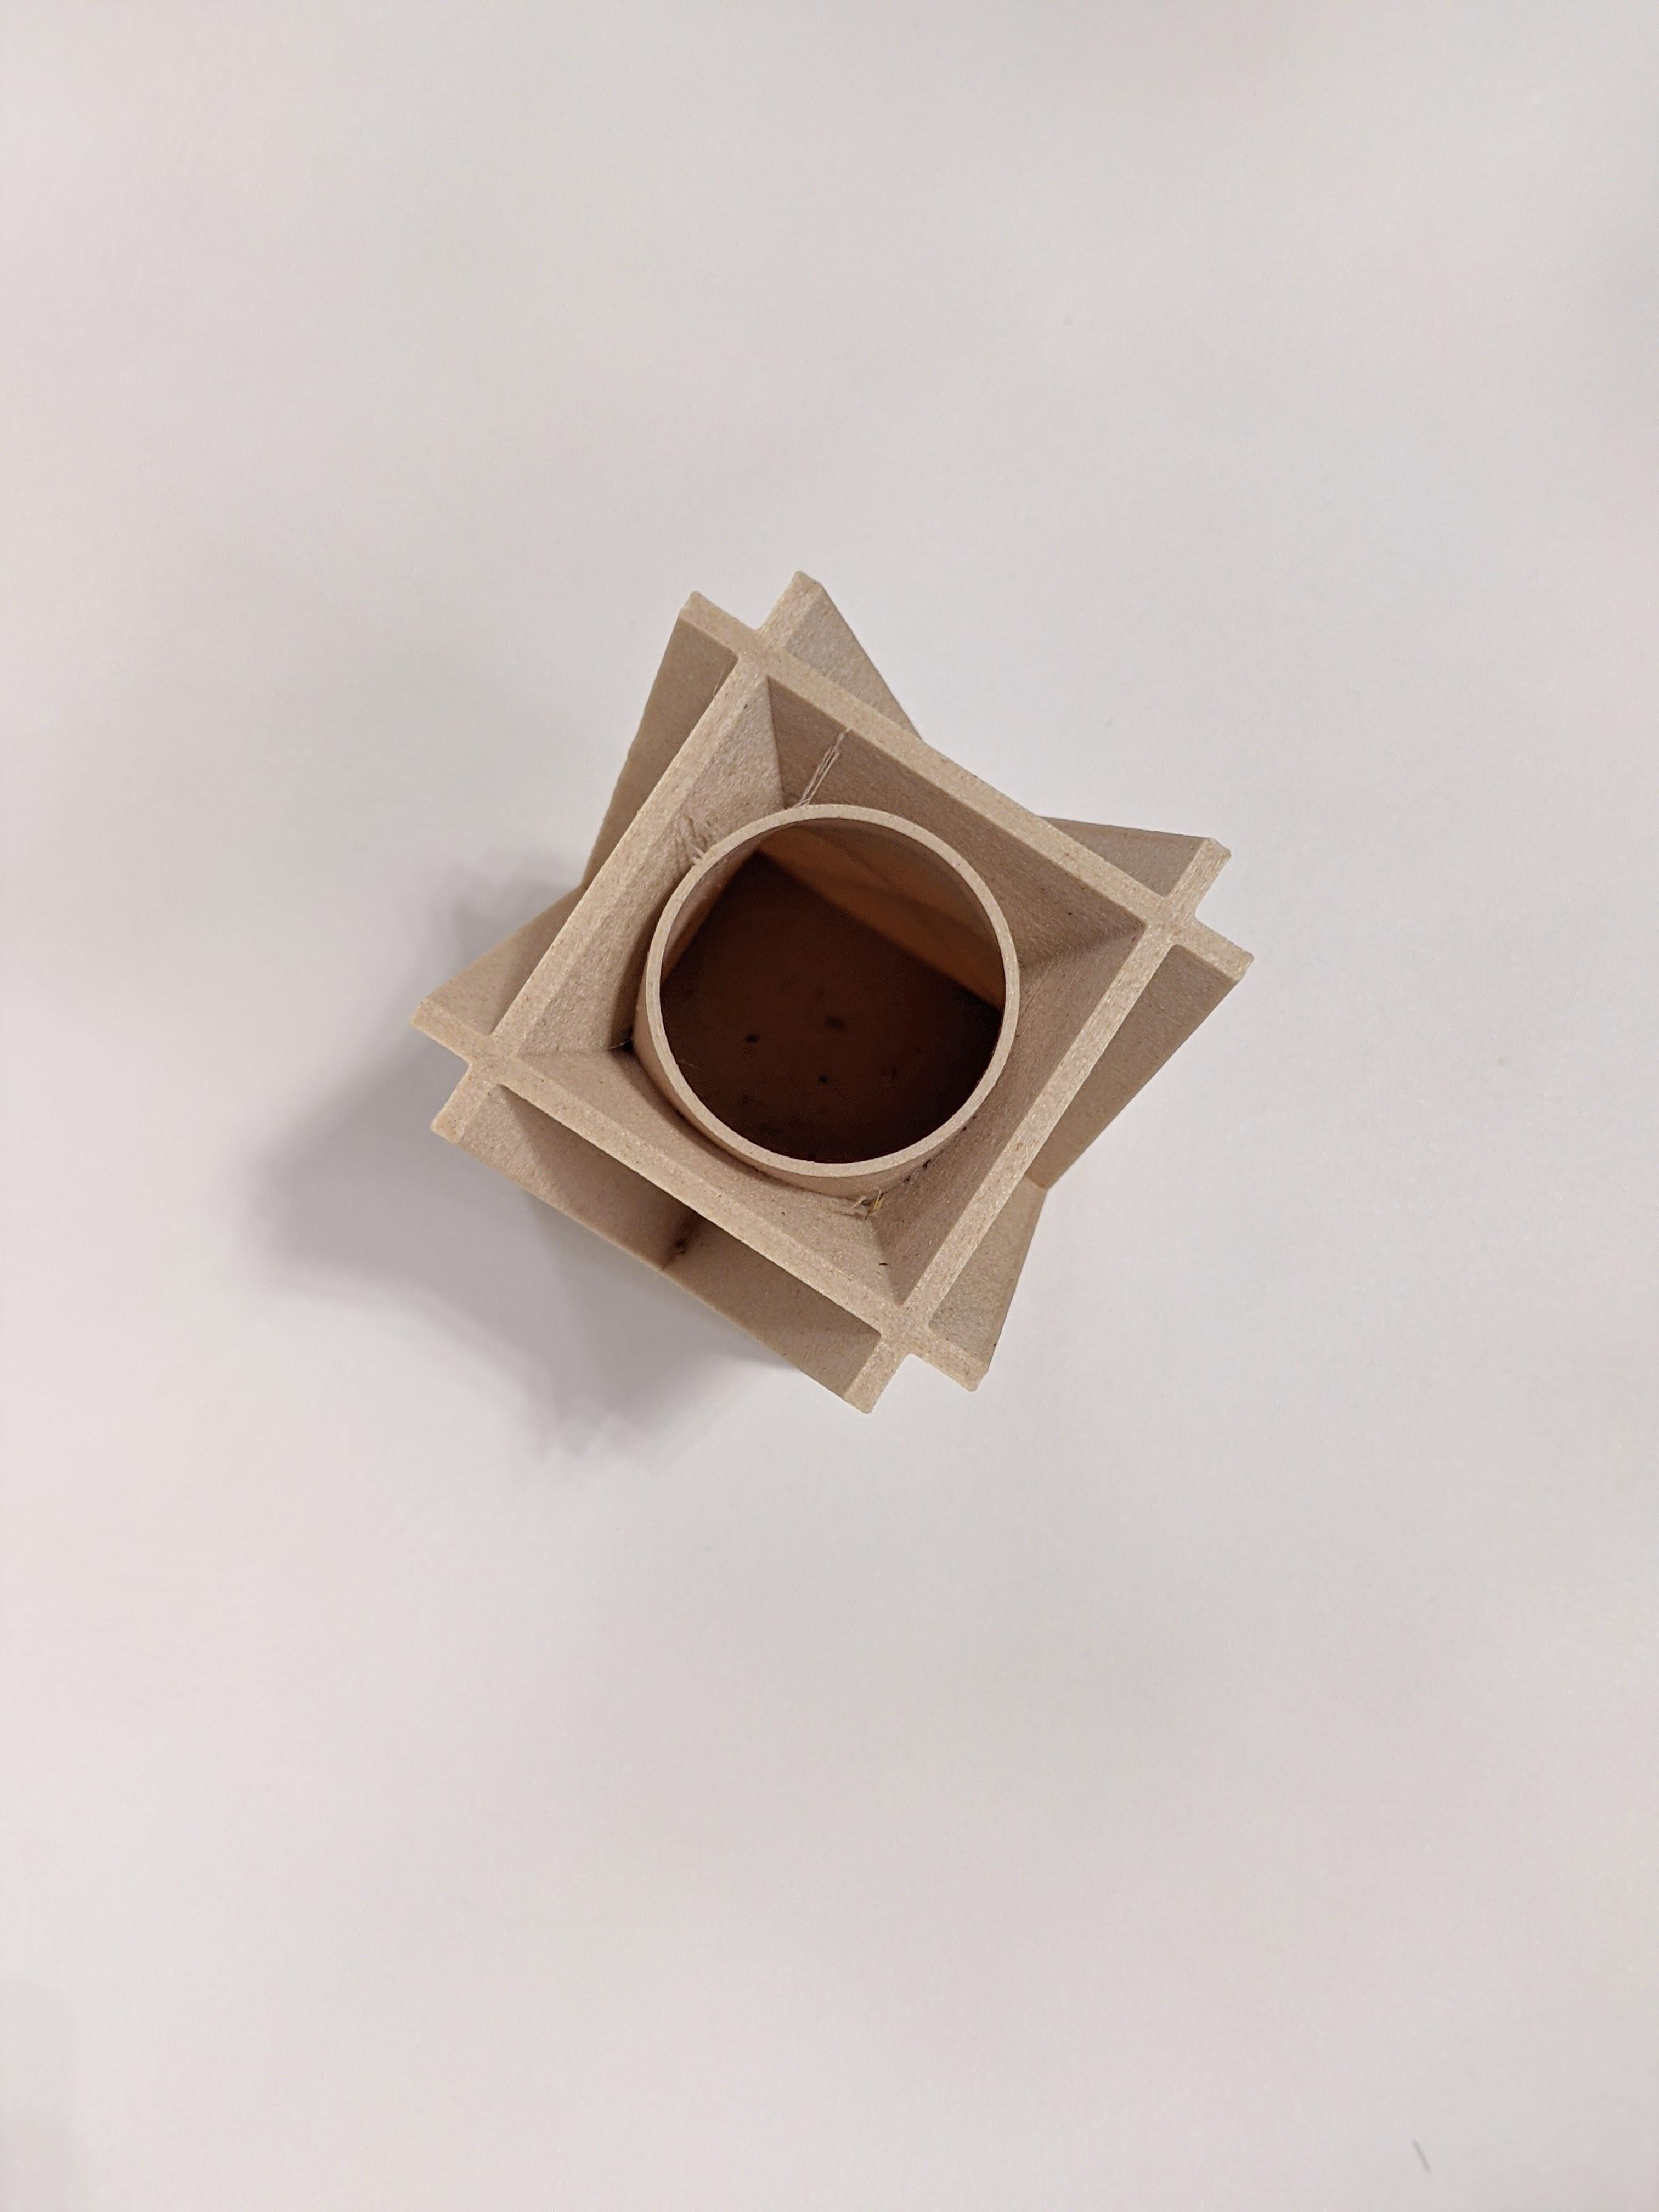 PXL_20201116_150238829.PORTRAIT-01.COVER.jpg Download free STL file X Brace Vase • 3D printable design, OrnjCreate